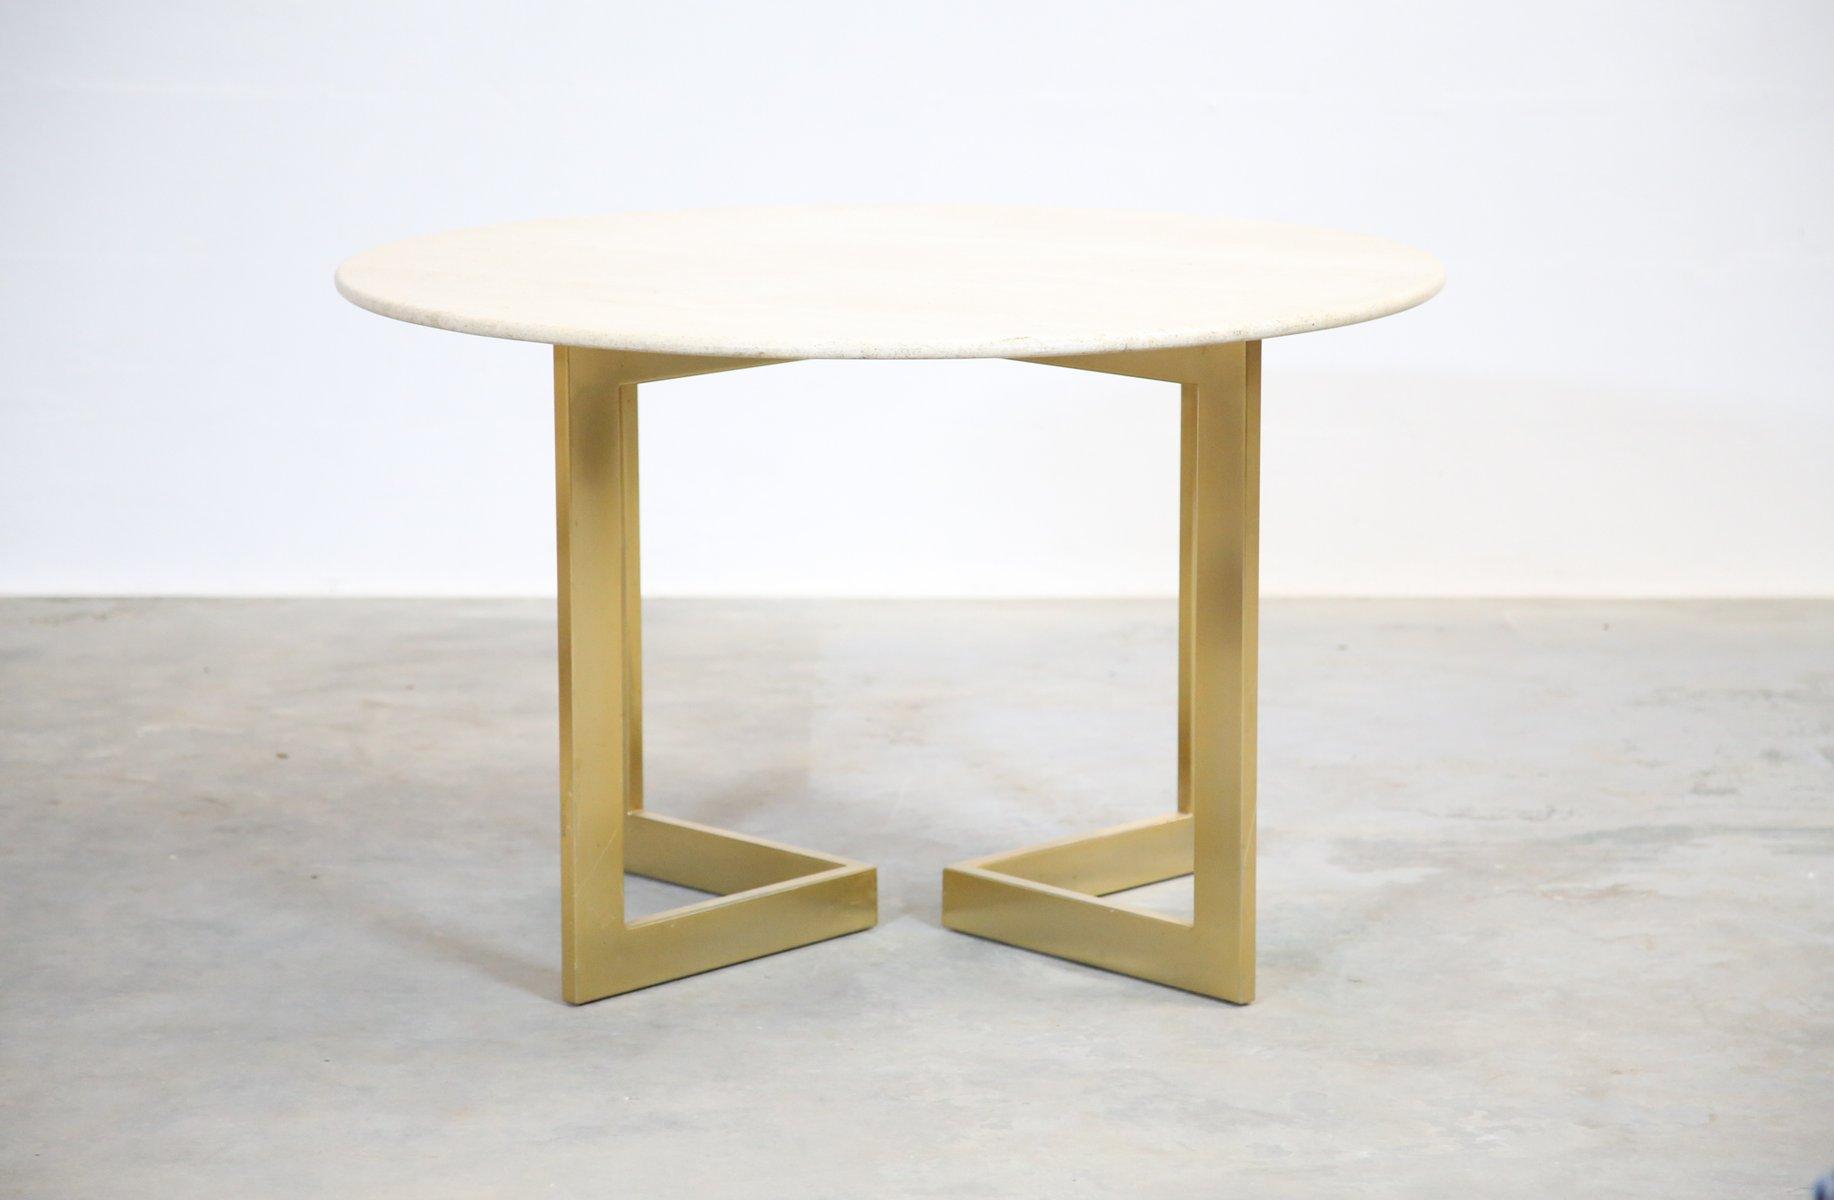 Vintage italian travertine round dining table 1970s for for Travertine dining table